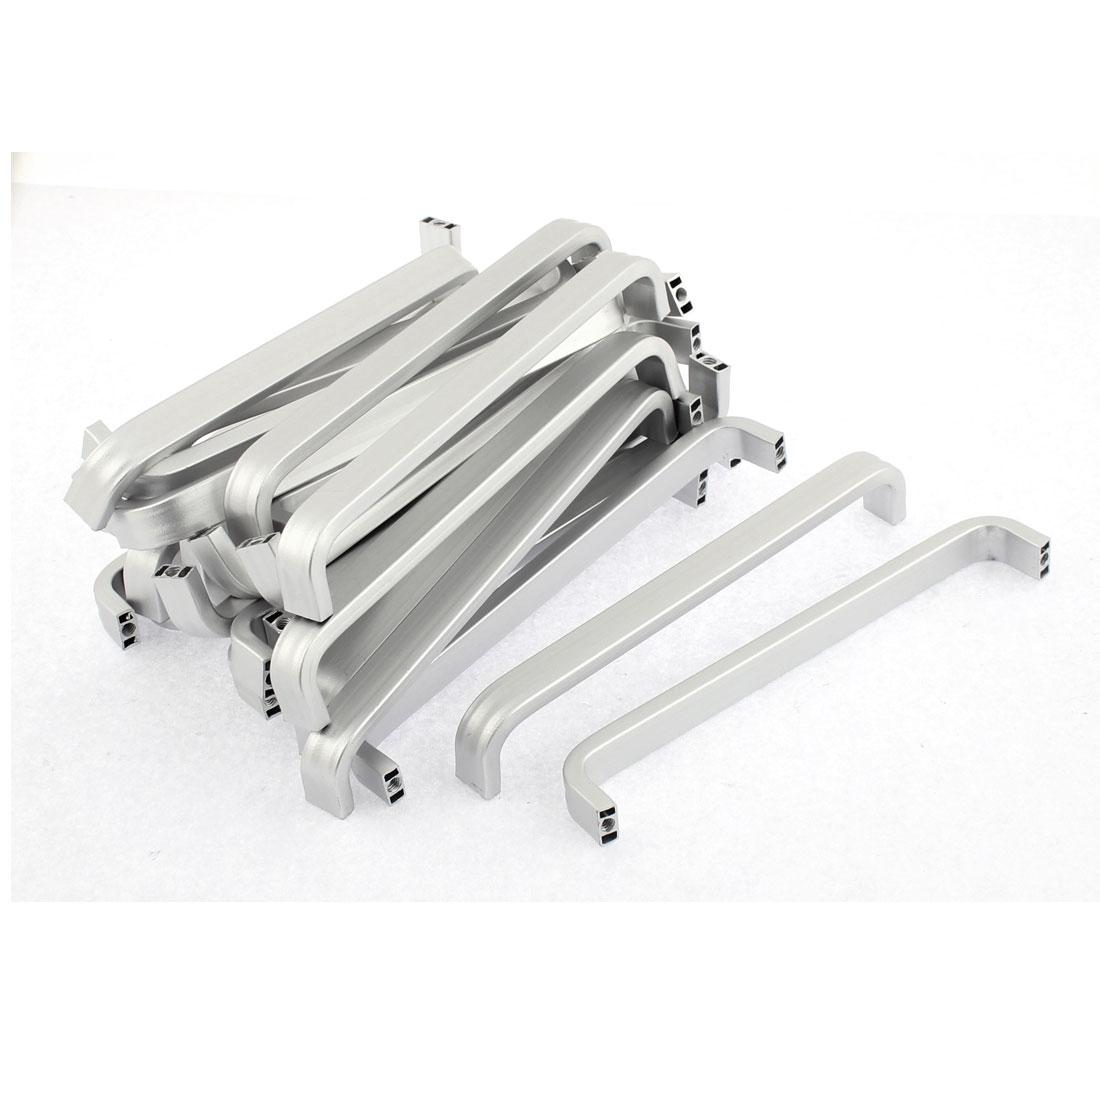 Furniture Drawer Aluminium Pull Handle 133mm Length Silver Tone 30pcs